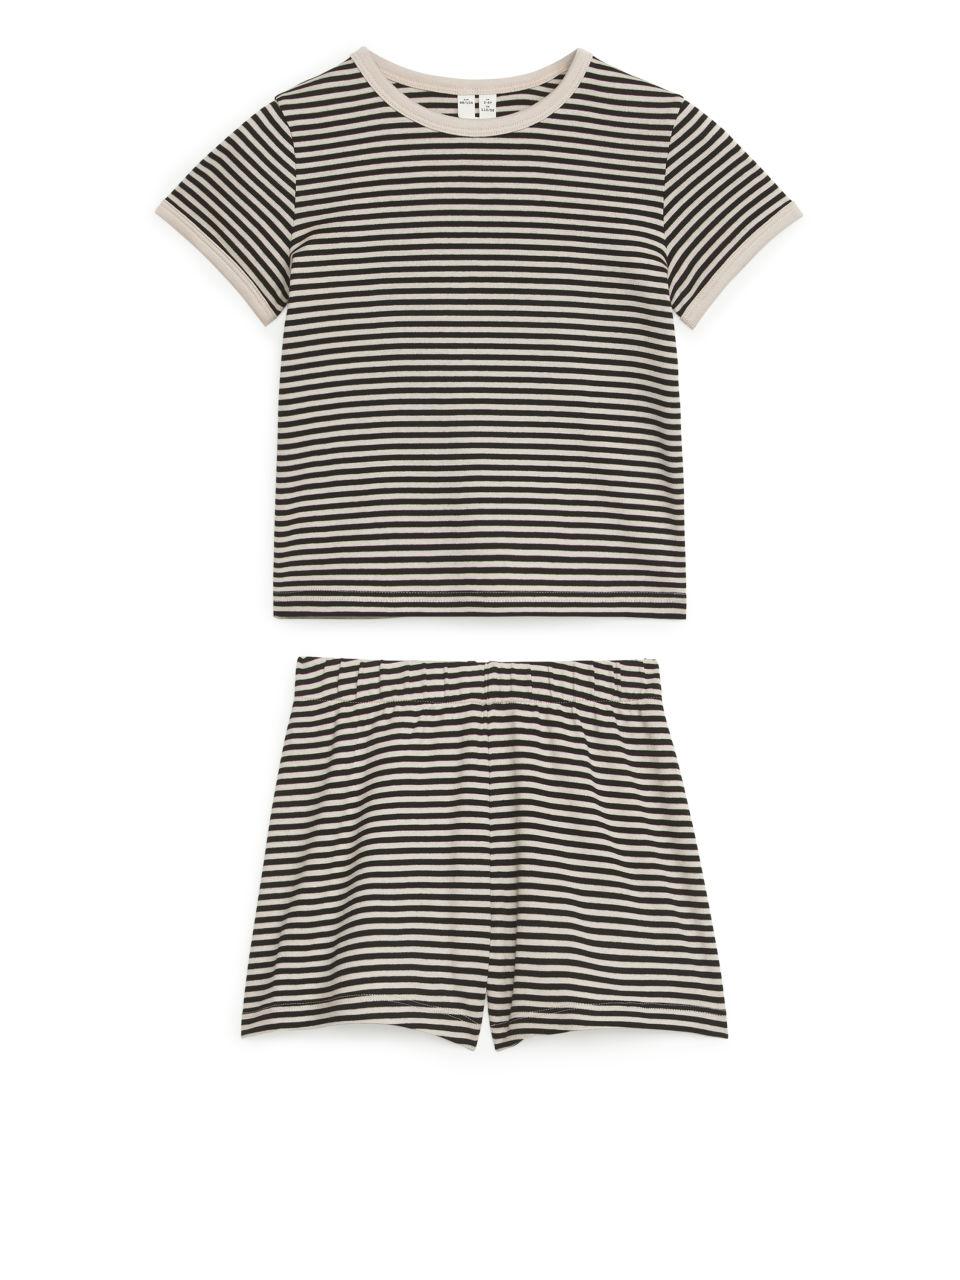 Short Jersey Pyjama Set - Black